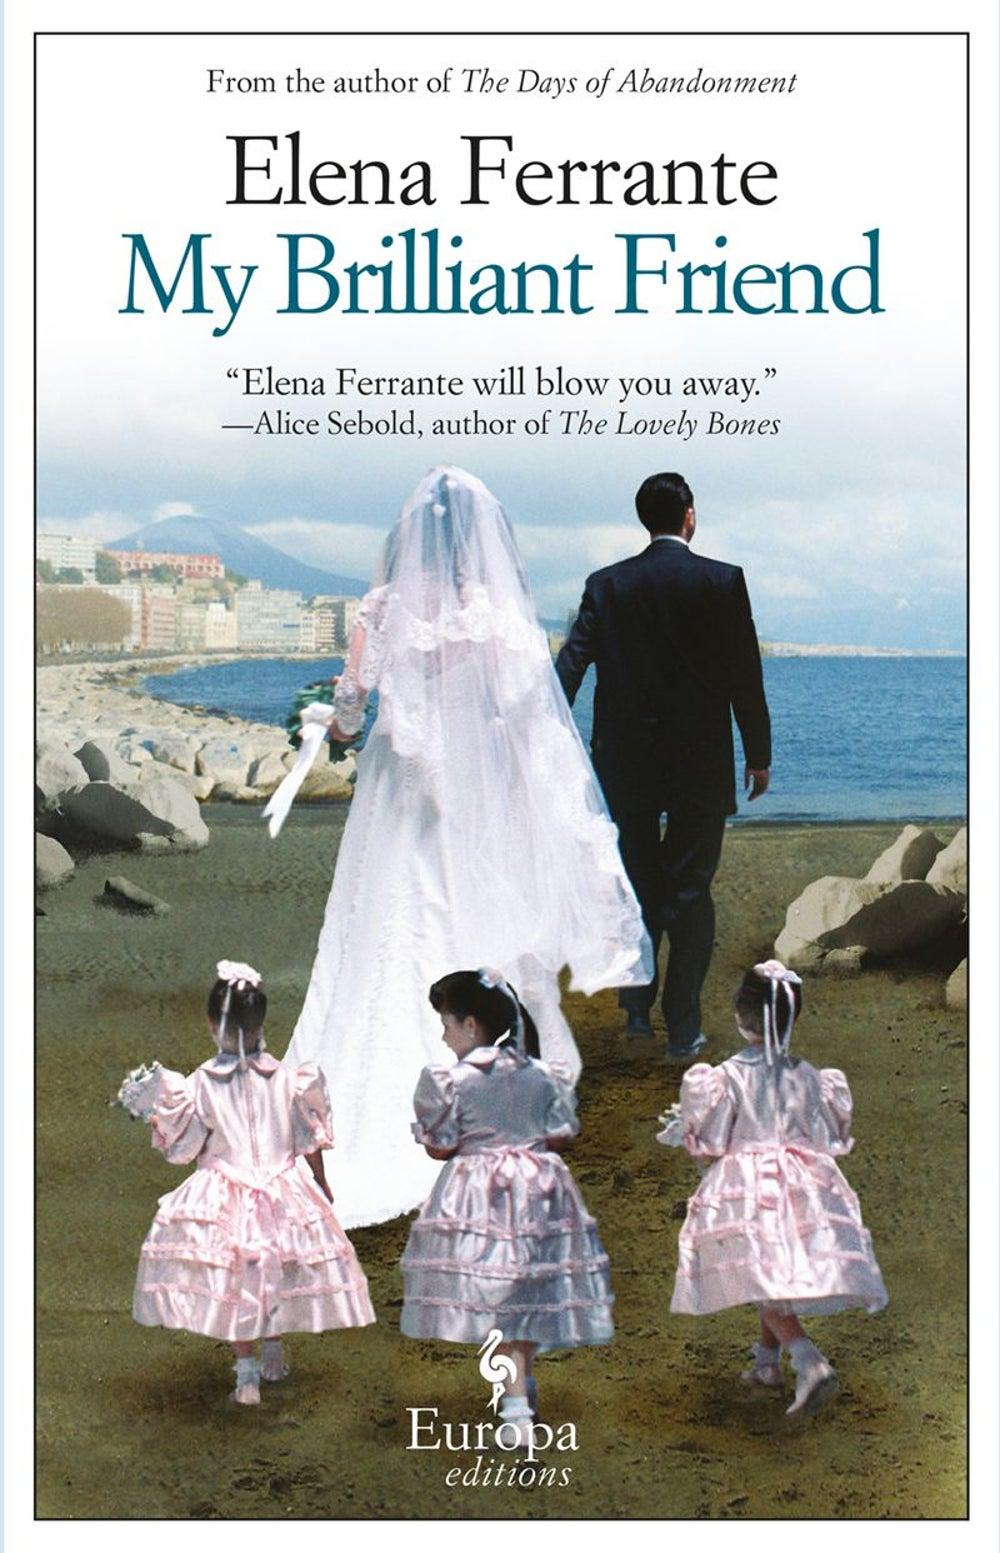 Associate Contributors Editor Joan Oleck -- 'My Brilliant Friend' by Elena Ferrante